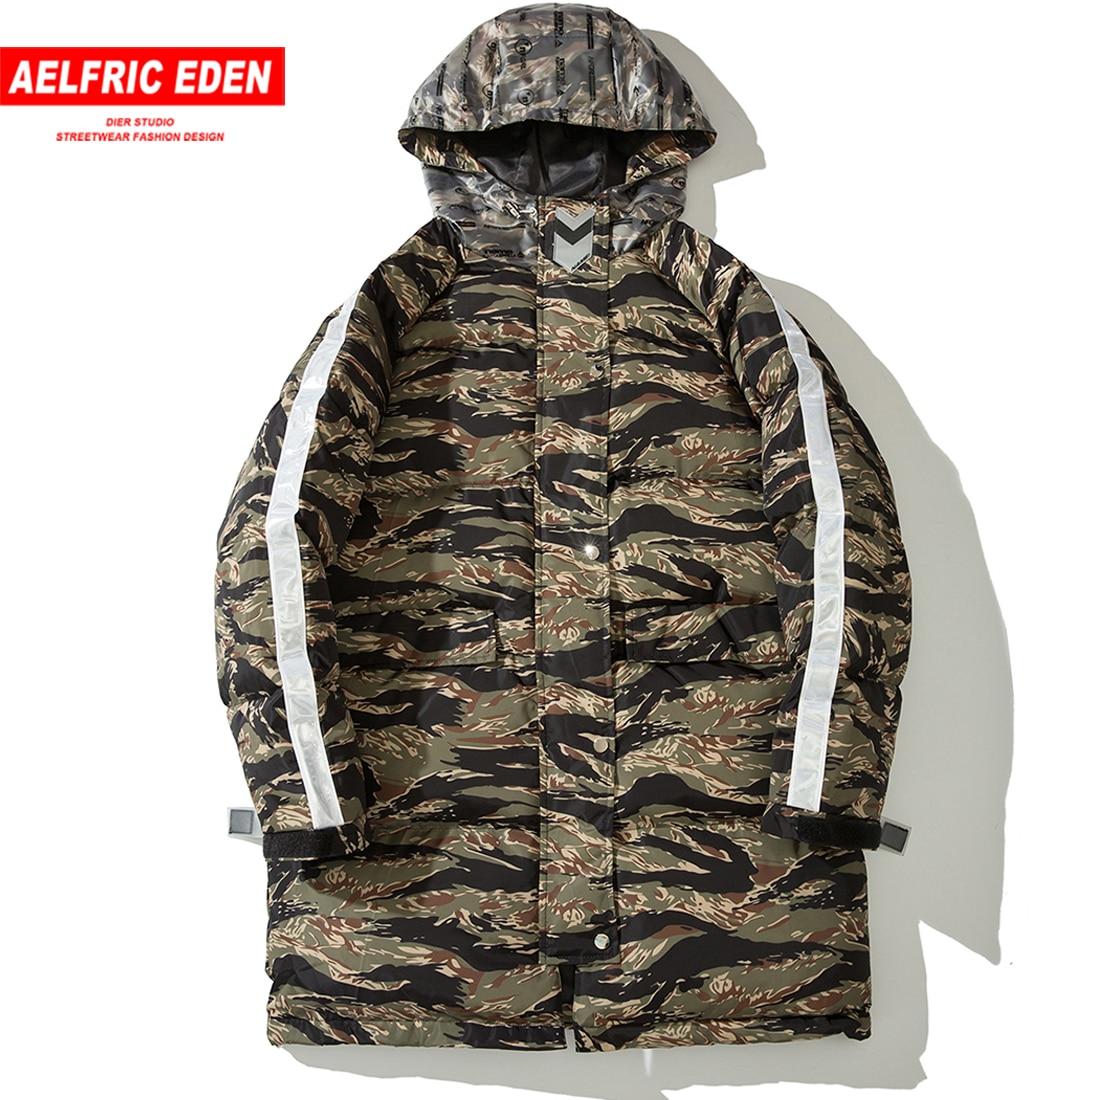 Aelfric Eden Harajuku Hoodies Mens Parkas Winter Clothes 2018 New Fashion Hip Hop Personality Warm Long Jackets and Coats Wa46